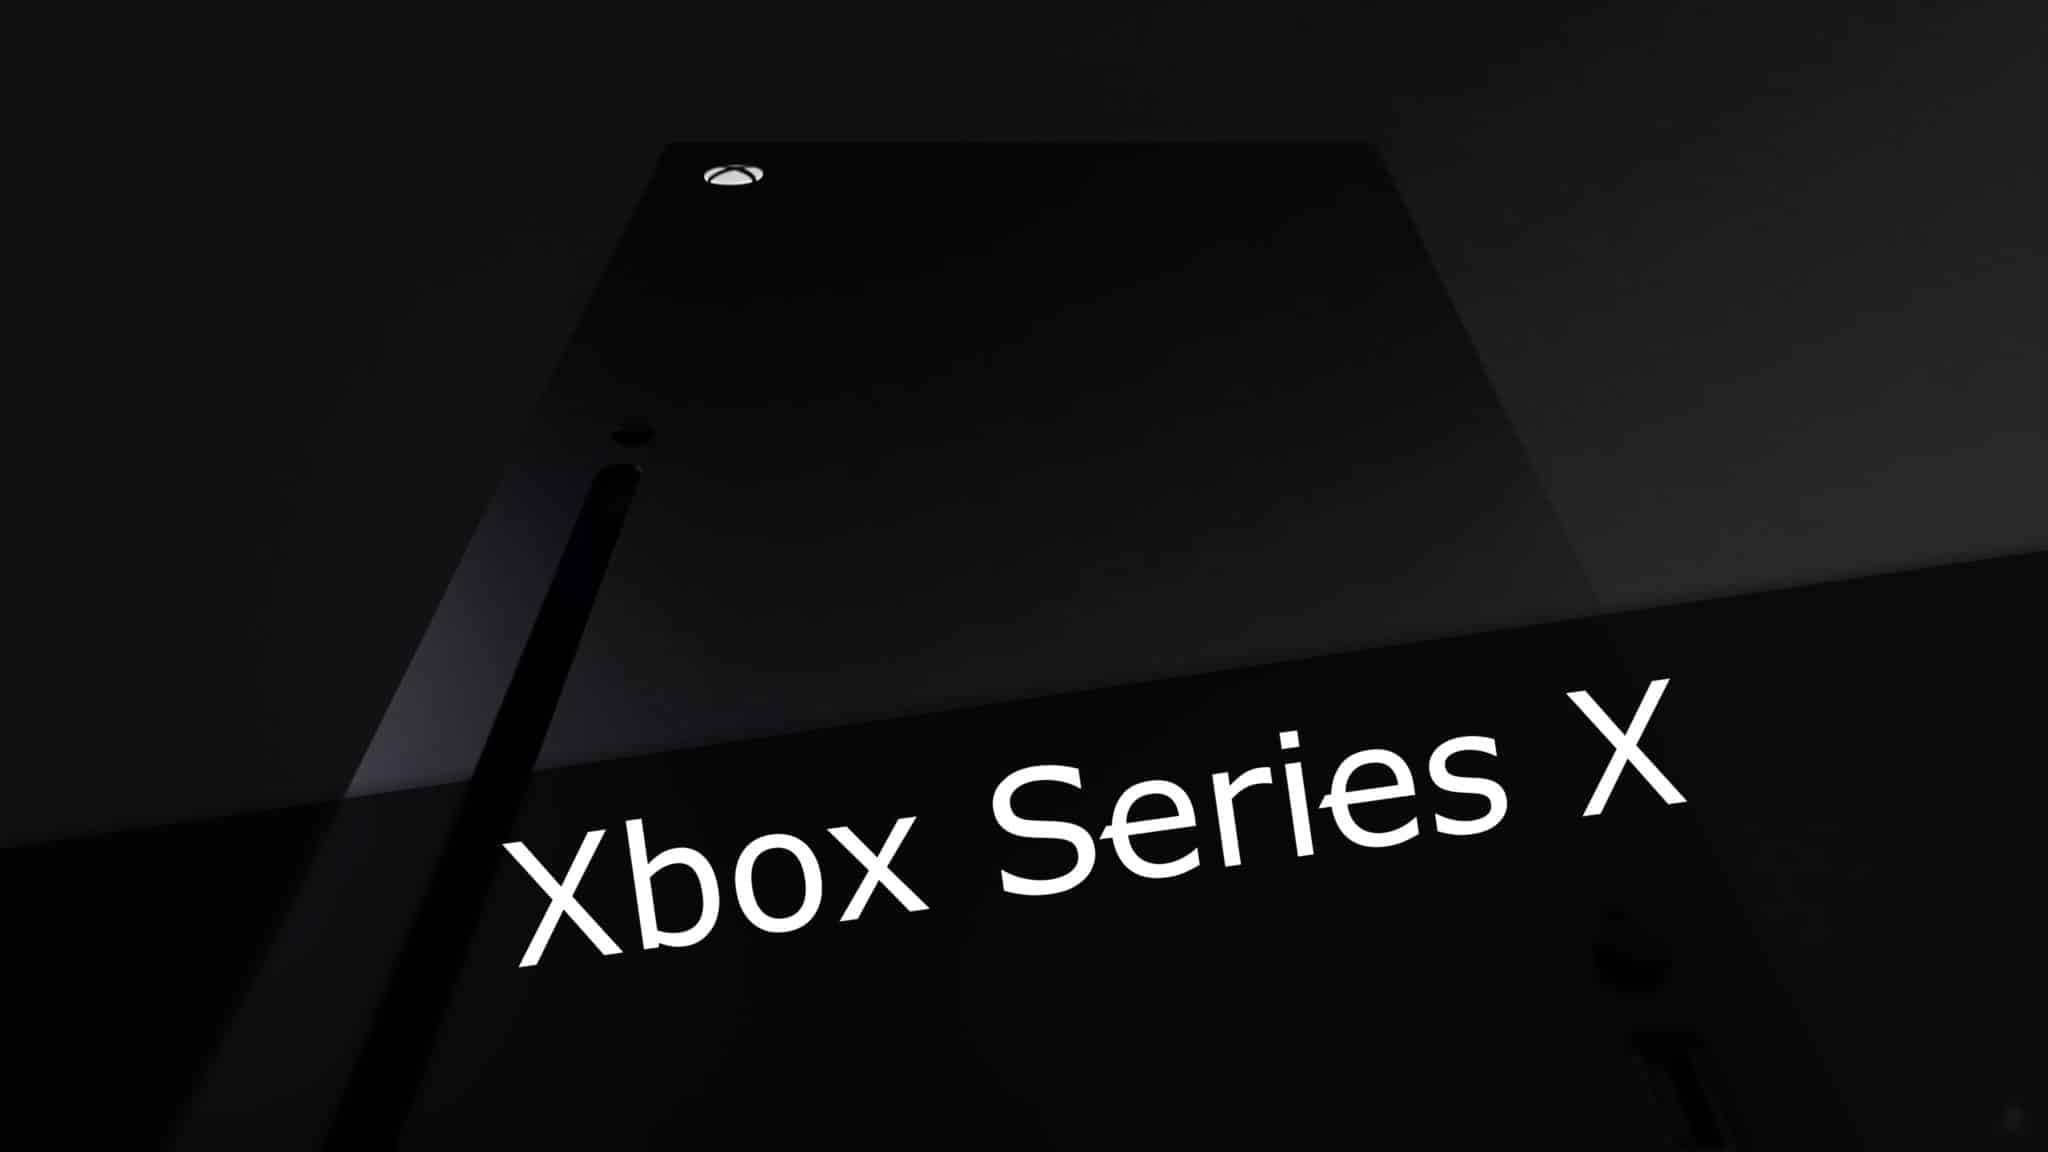 Xbox, Microsoft, Gaming, Xbox Series X